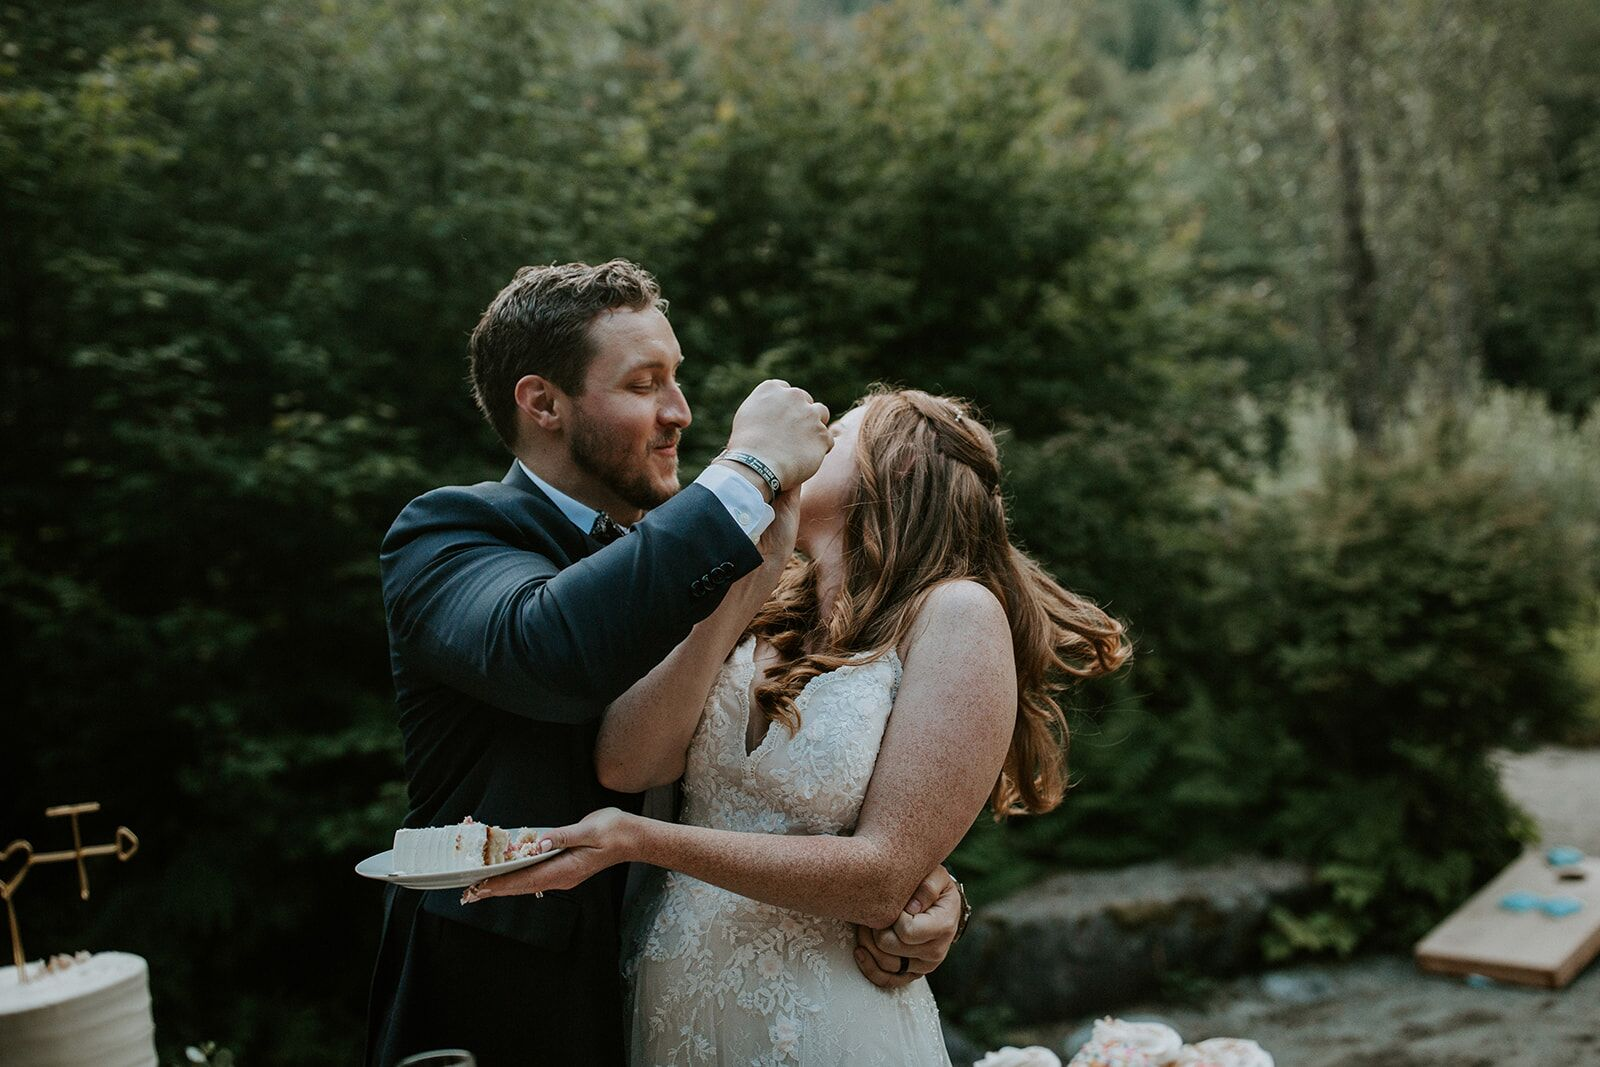 Blue-Sky-Ranch-Wedding-Block-Weddings-and-Events35.jpeg